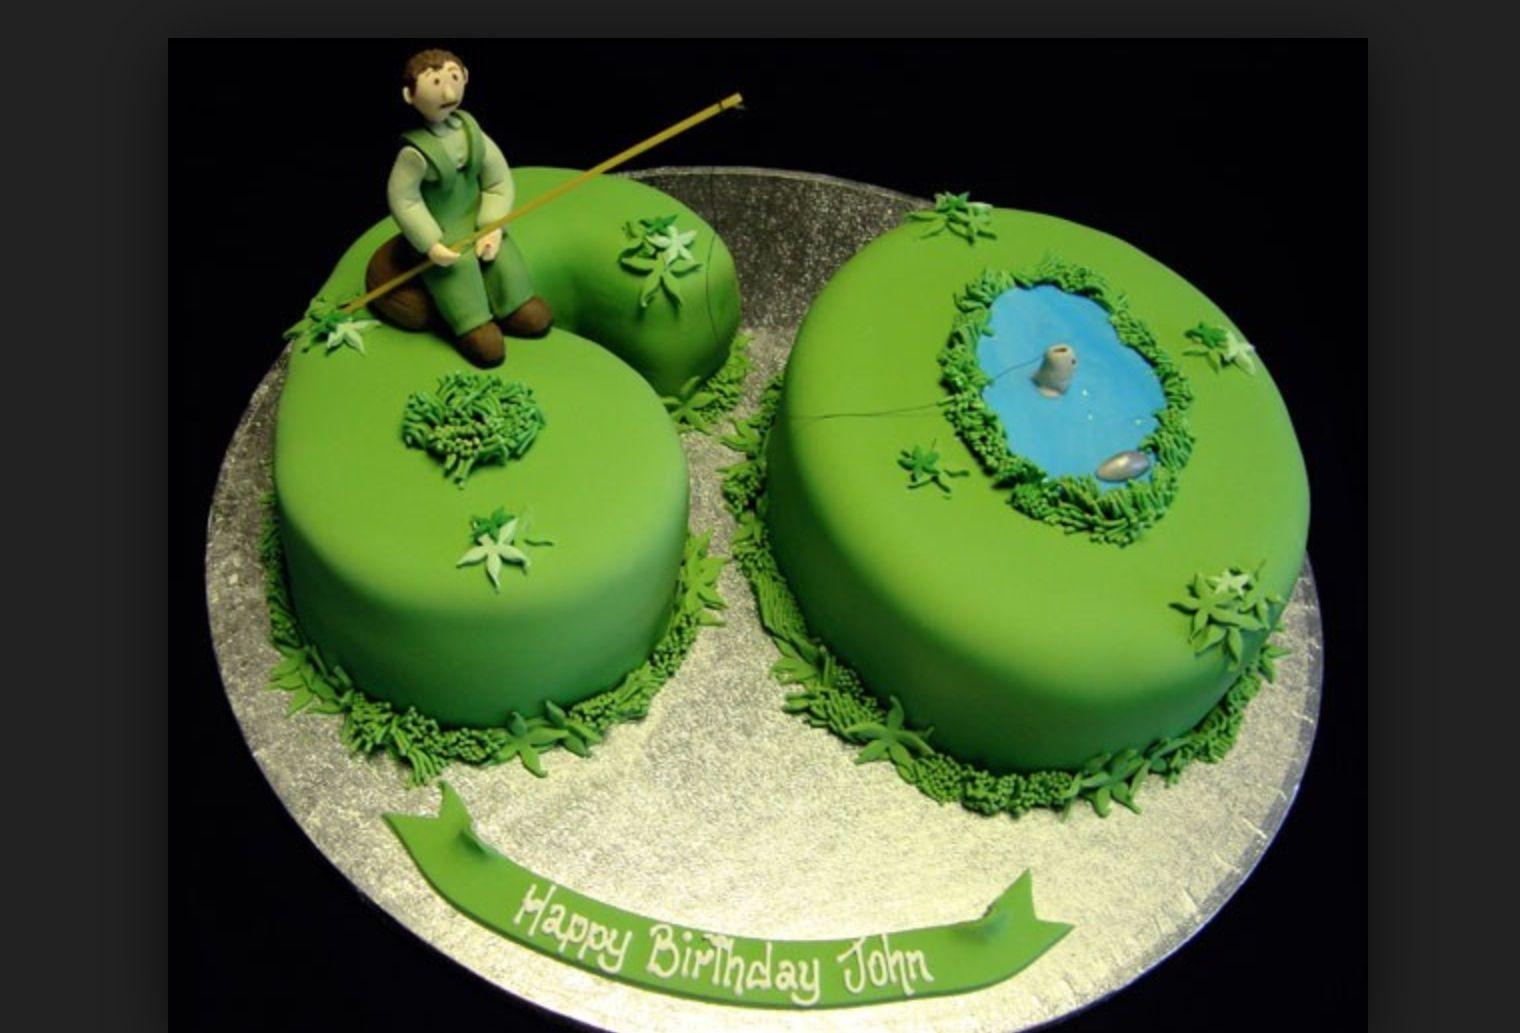 Fishing cake dads 60th birthday cake idea DADS BIRTHDAY